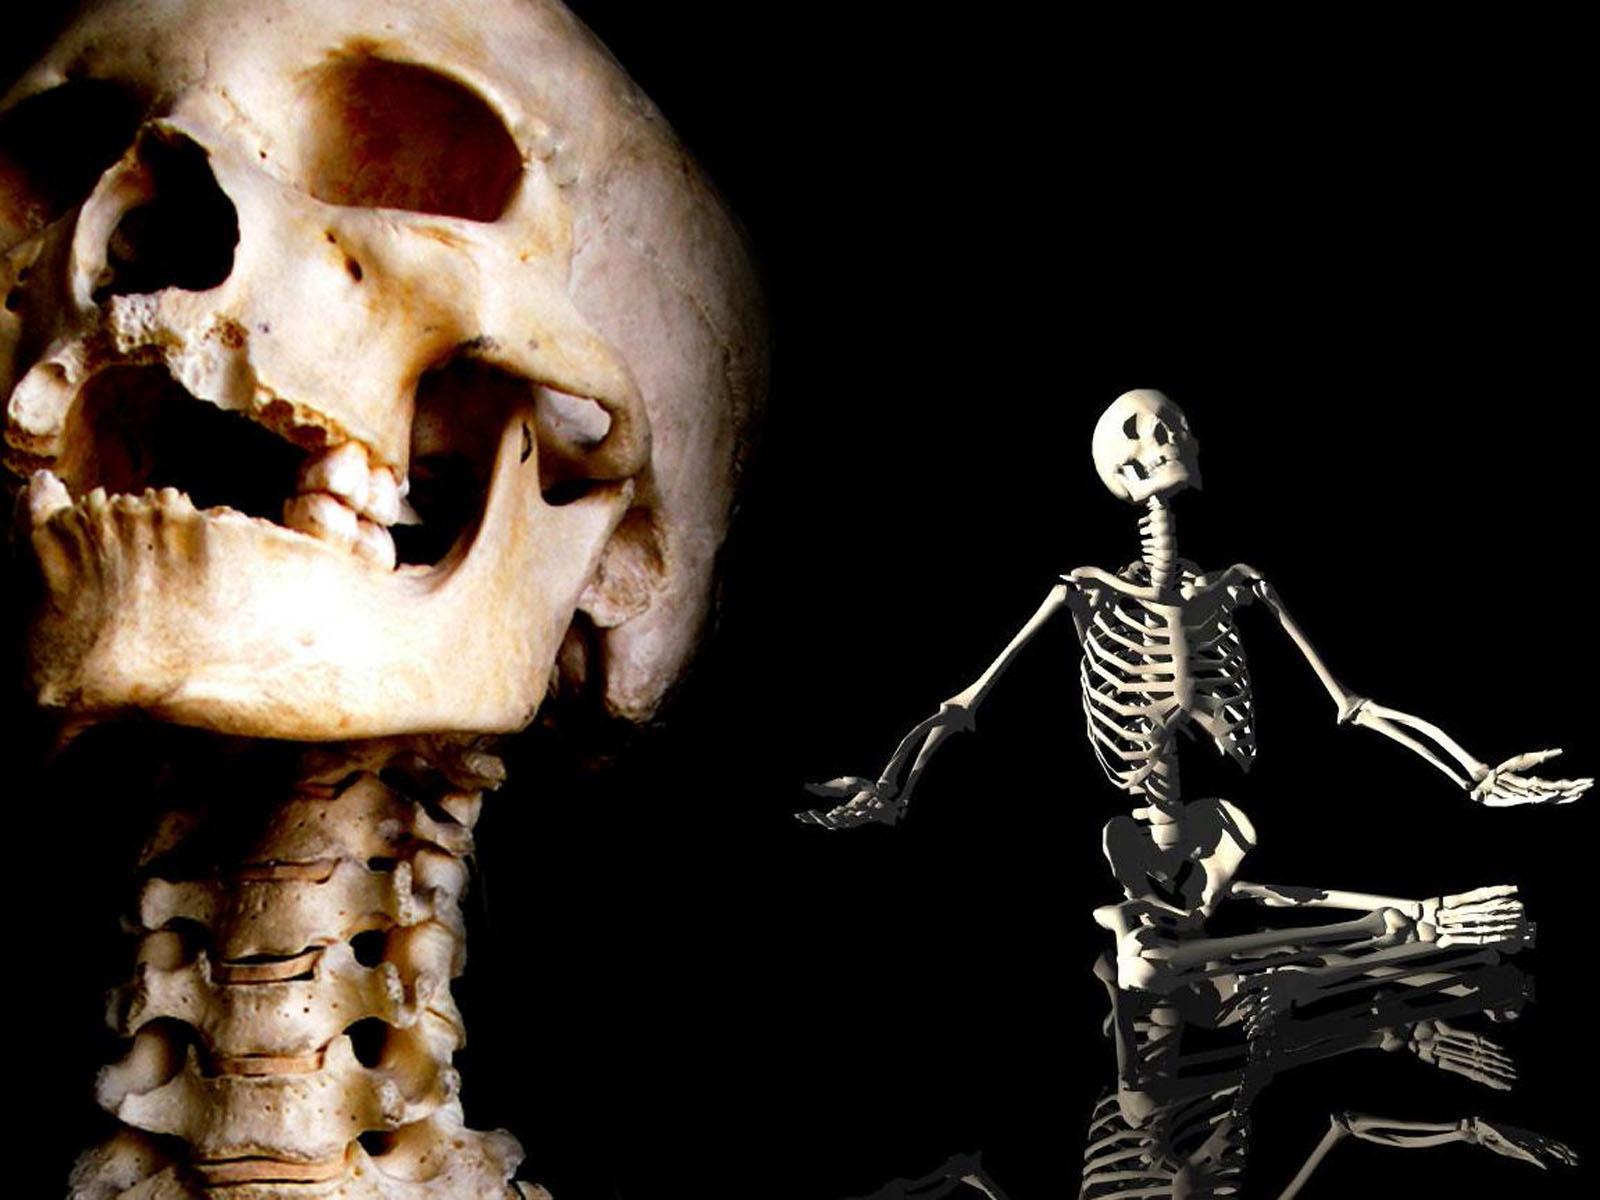 Halloween Skeleton Wallpaper.Free Download Wallpapers Skeleton Wallpapers 1600x1200 For